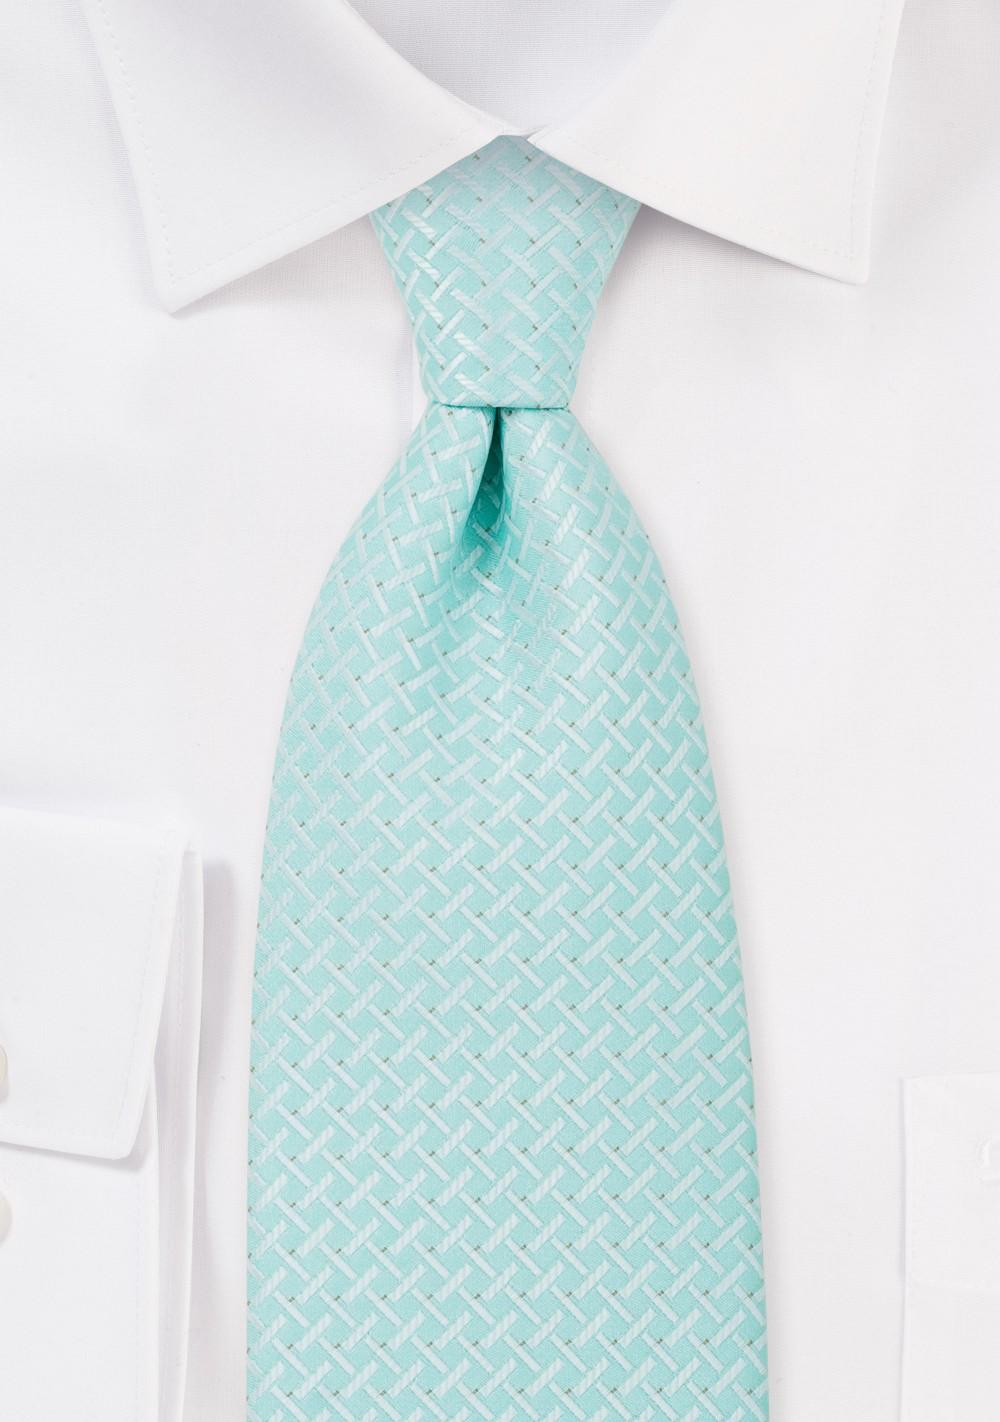 Light Mint Green Kids Necktie